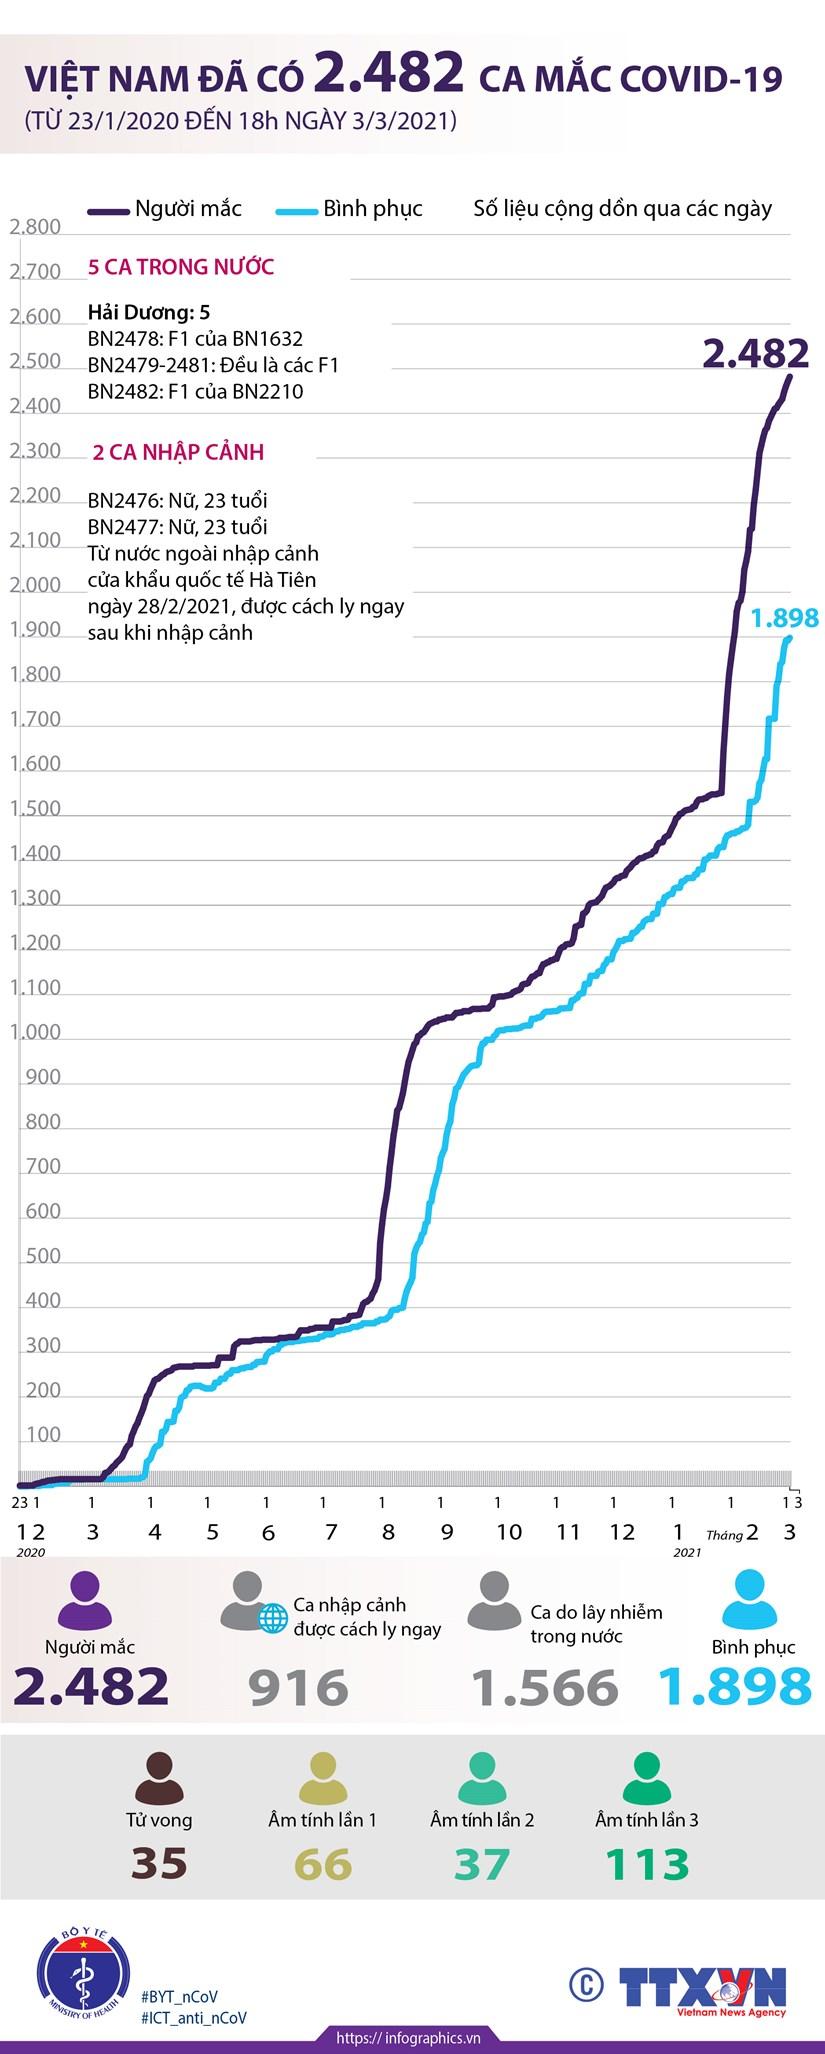 [Infographics] Viet Nam da co 2.482 ca mac dich benh COVID-19 hinh anh 1